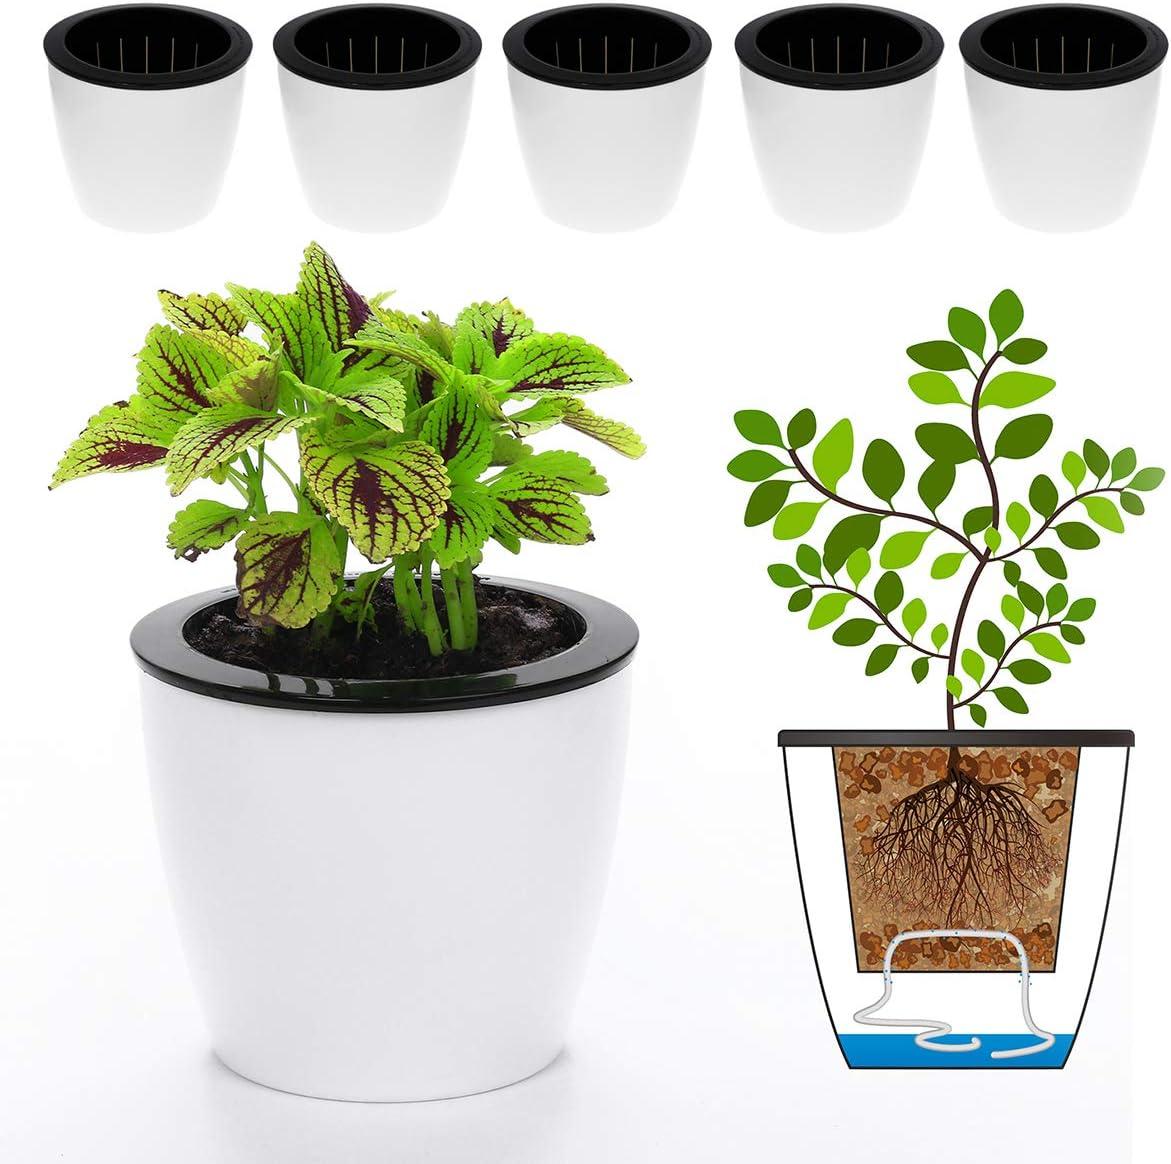 DElf 6 Pack 6.7 Self Watering Planter Wicking Pots for Indoor Golden Devil s Ivy, African Violet, Ocean Spider Plant, Orchid, White Color